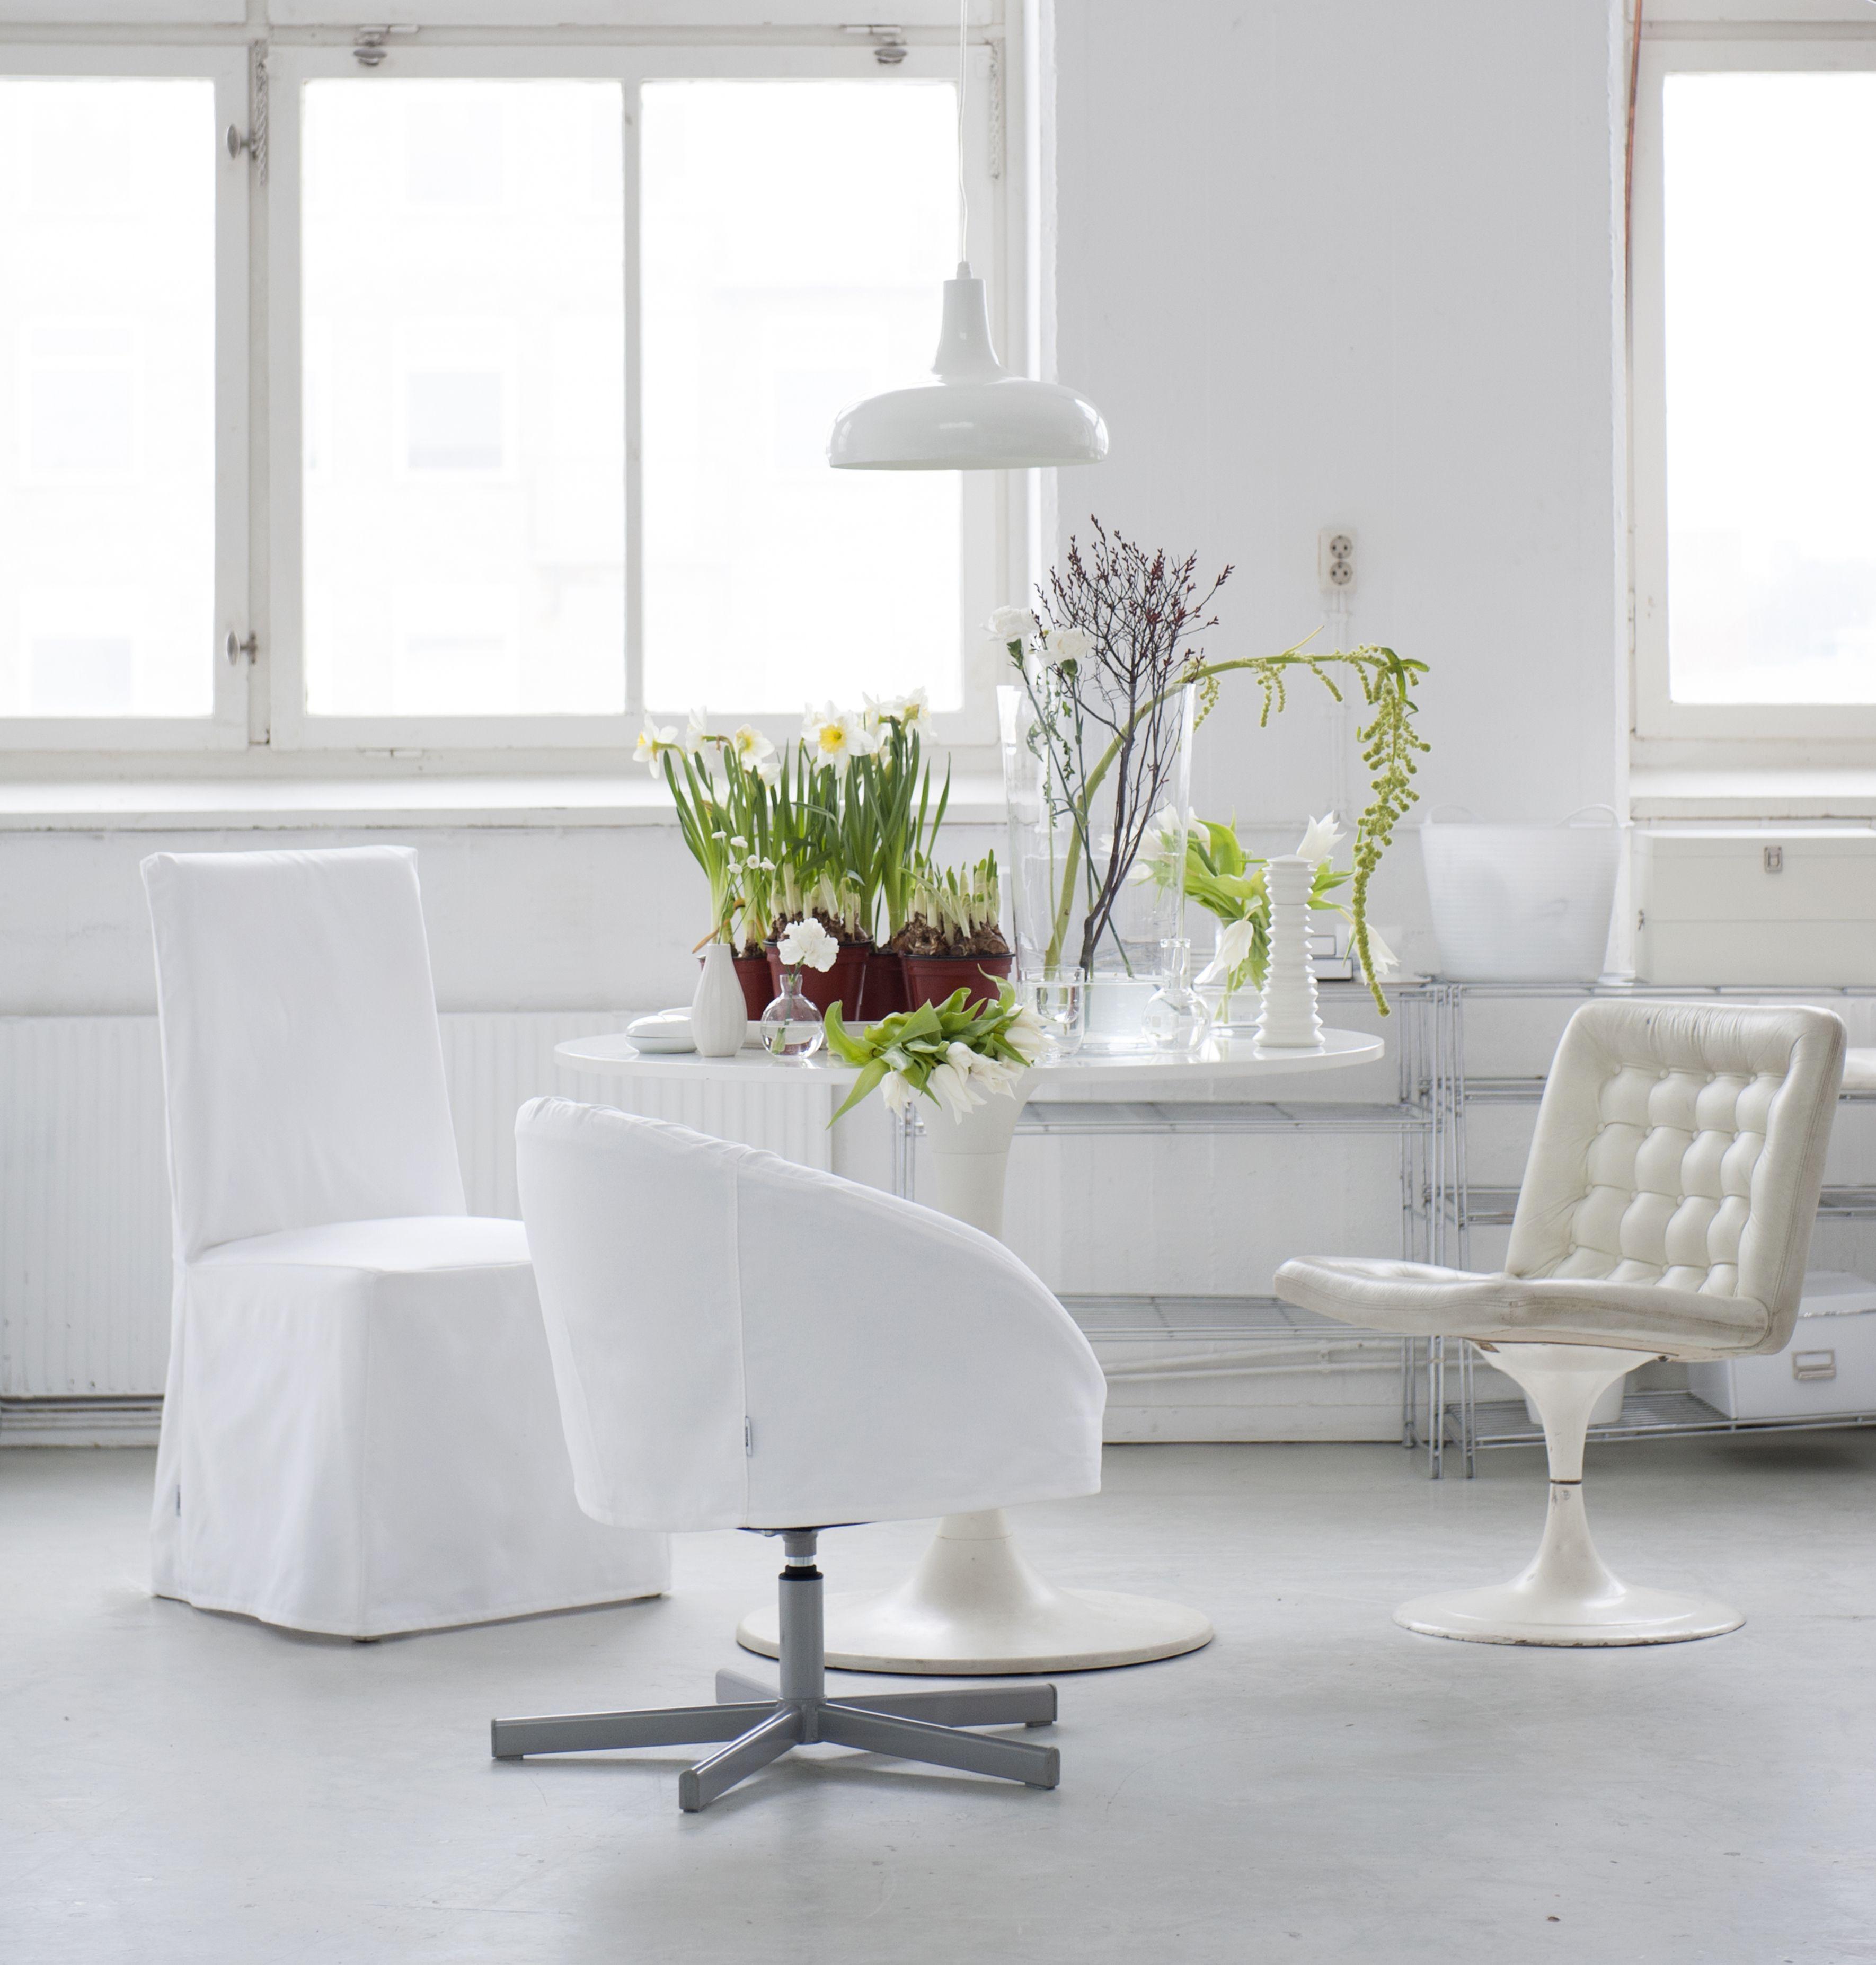 Skruvsta Swivel Chair Cover Chair Covers Bemz White